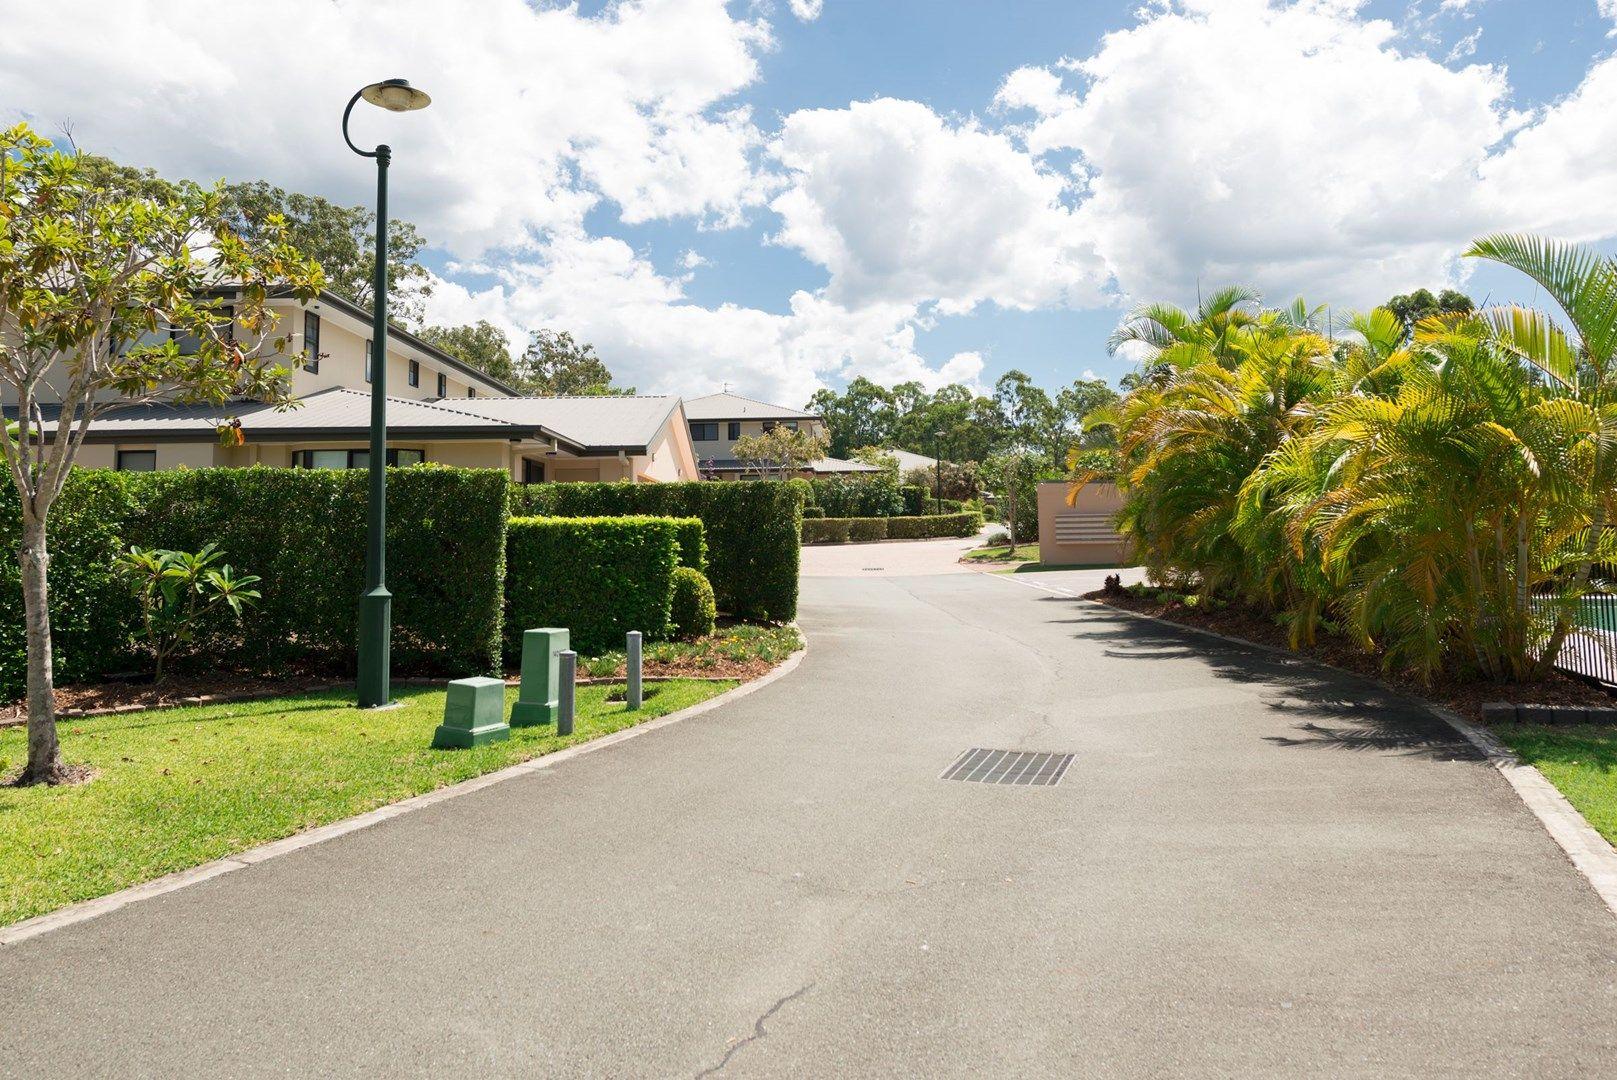 25/145 Gemvale Road, Mudgeeraba QLD 4213, Image 0